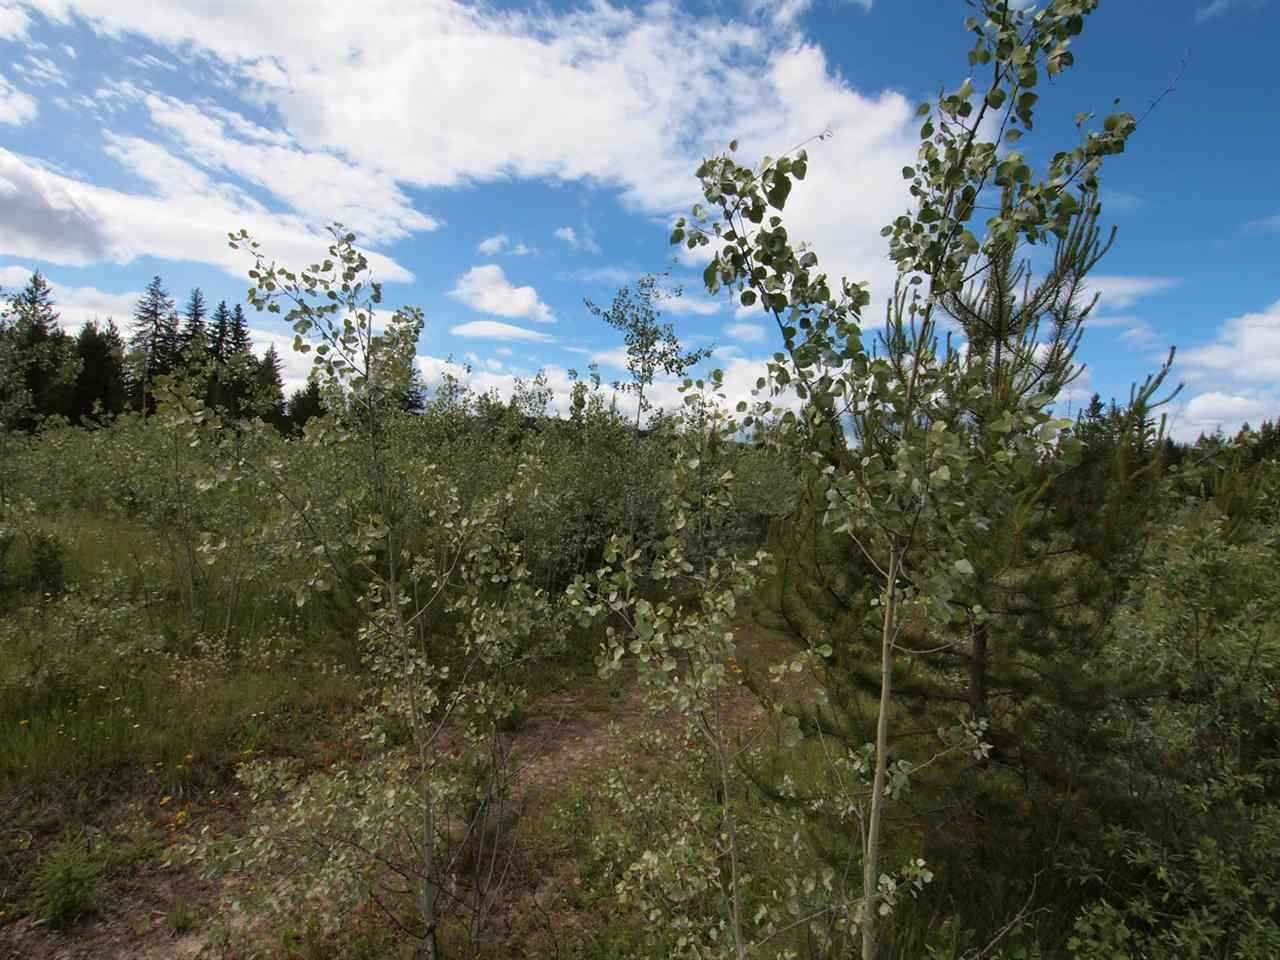 Photo 11: Photos: 4573 BAKKEN Road: Forest Grove Land for sale (100 Mile House (Zone 10))  : MLS®# R2377308